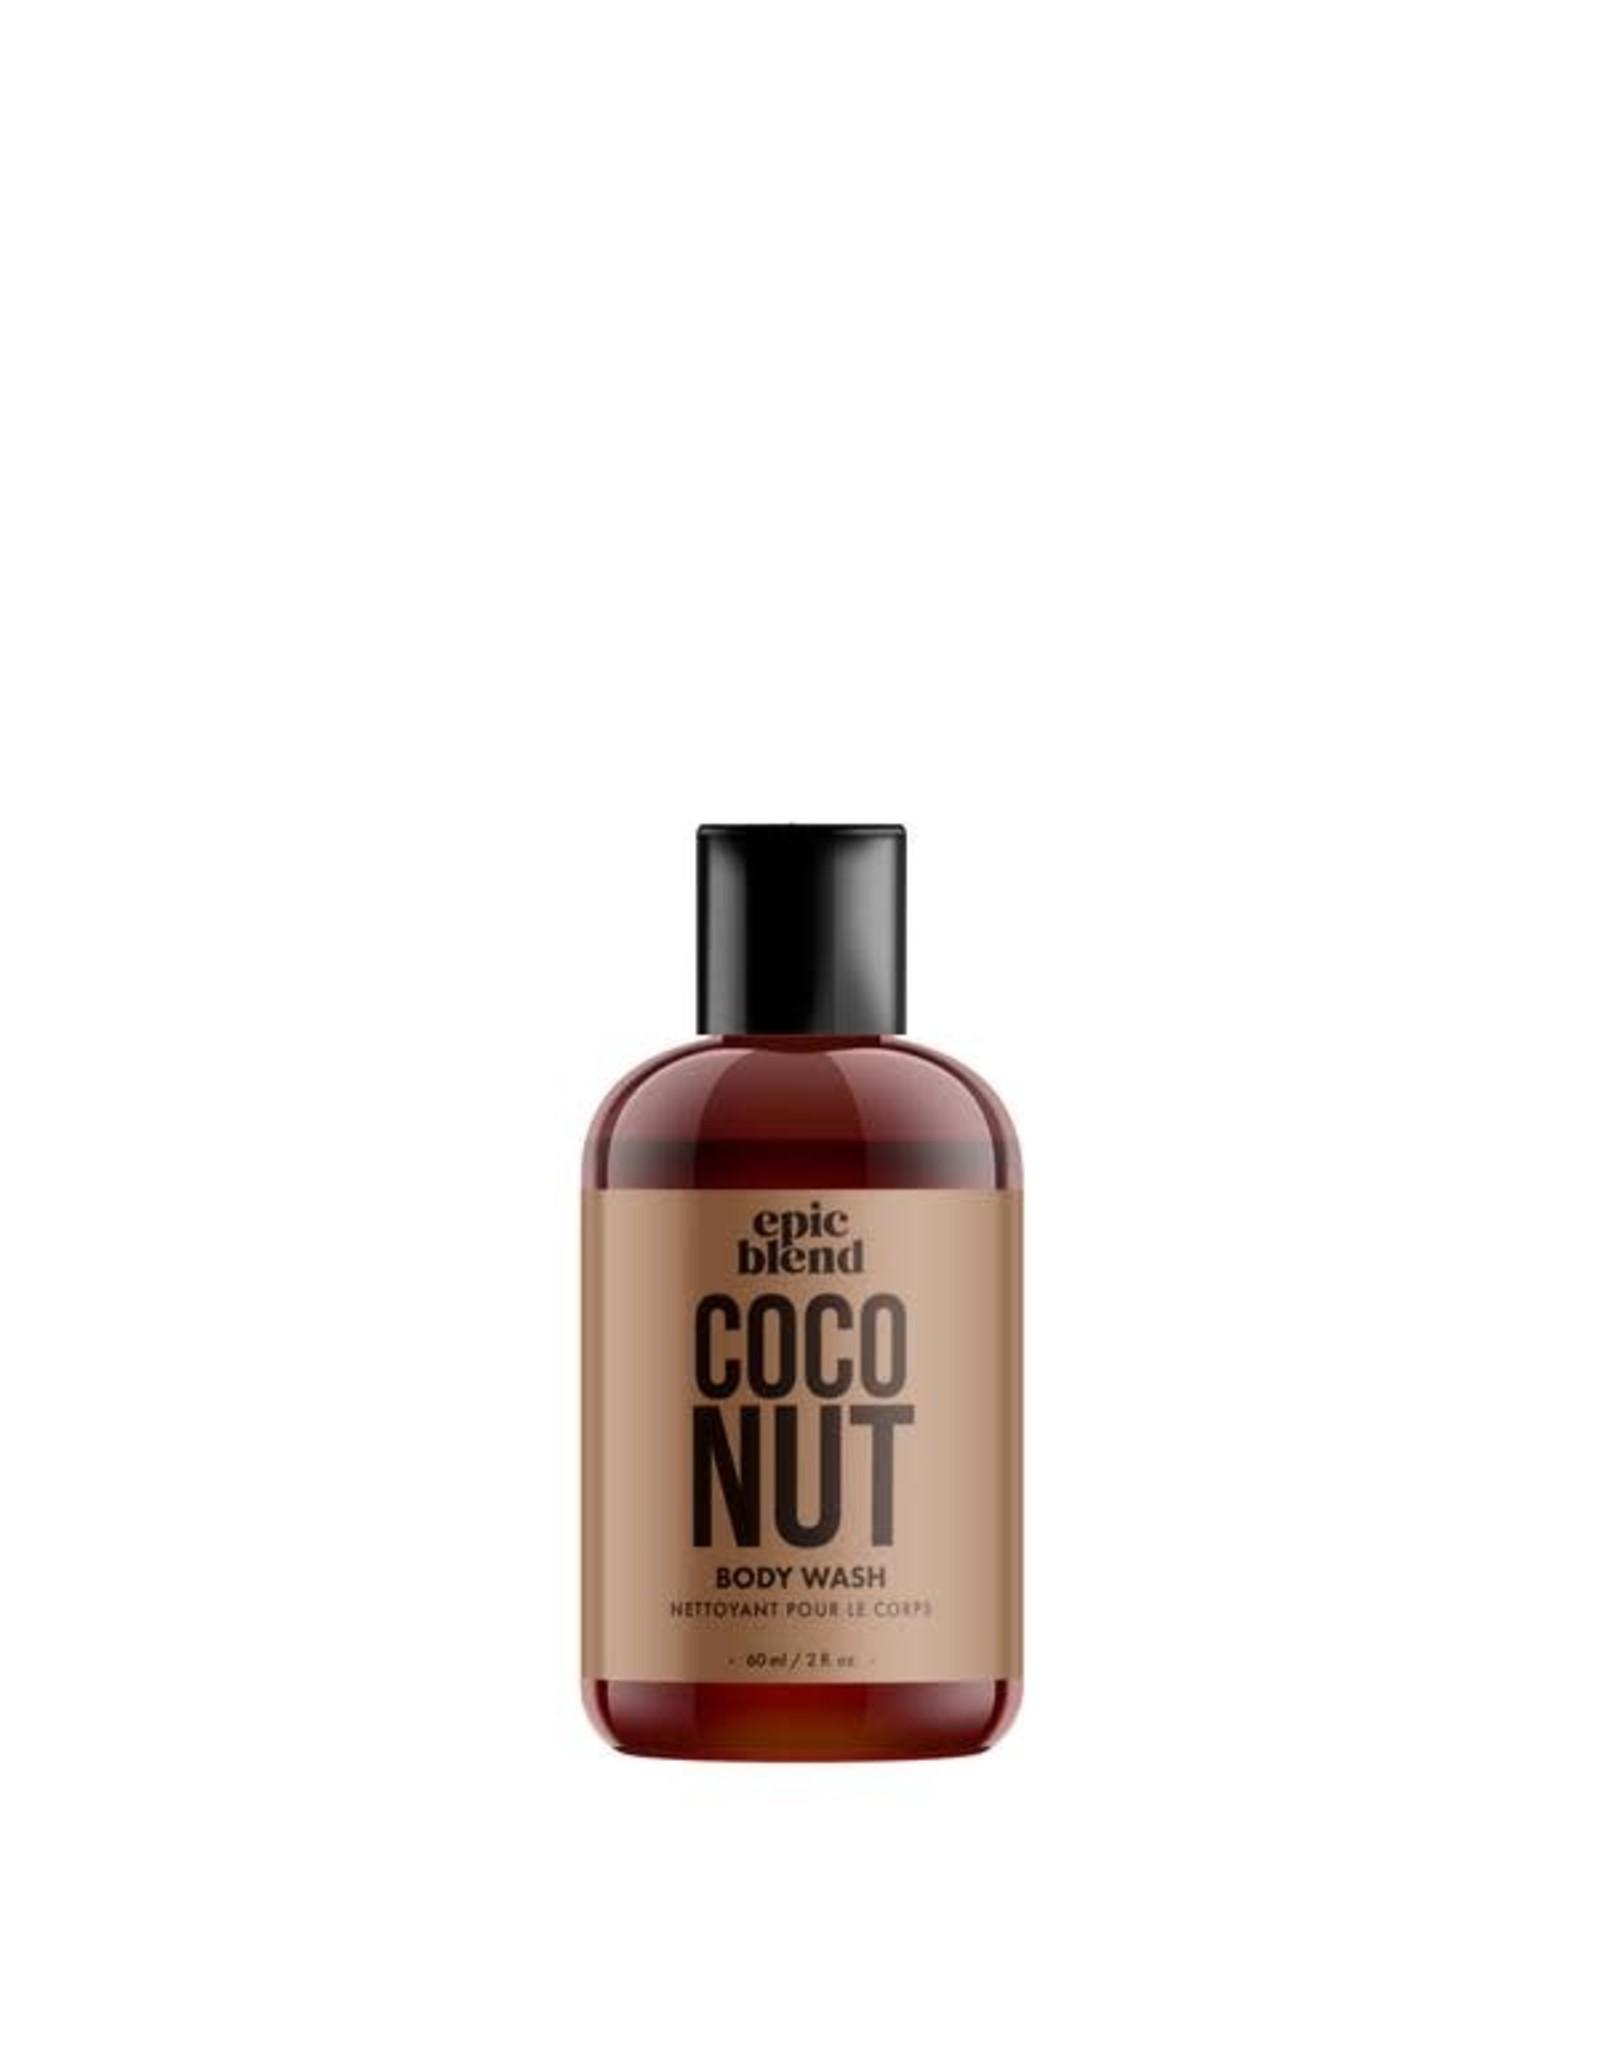 Epic Blend Coconut Body Wash